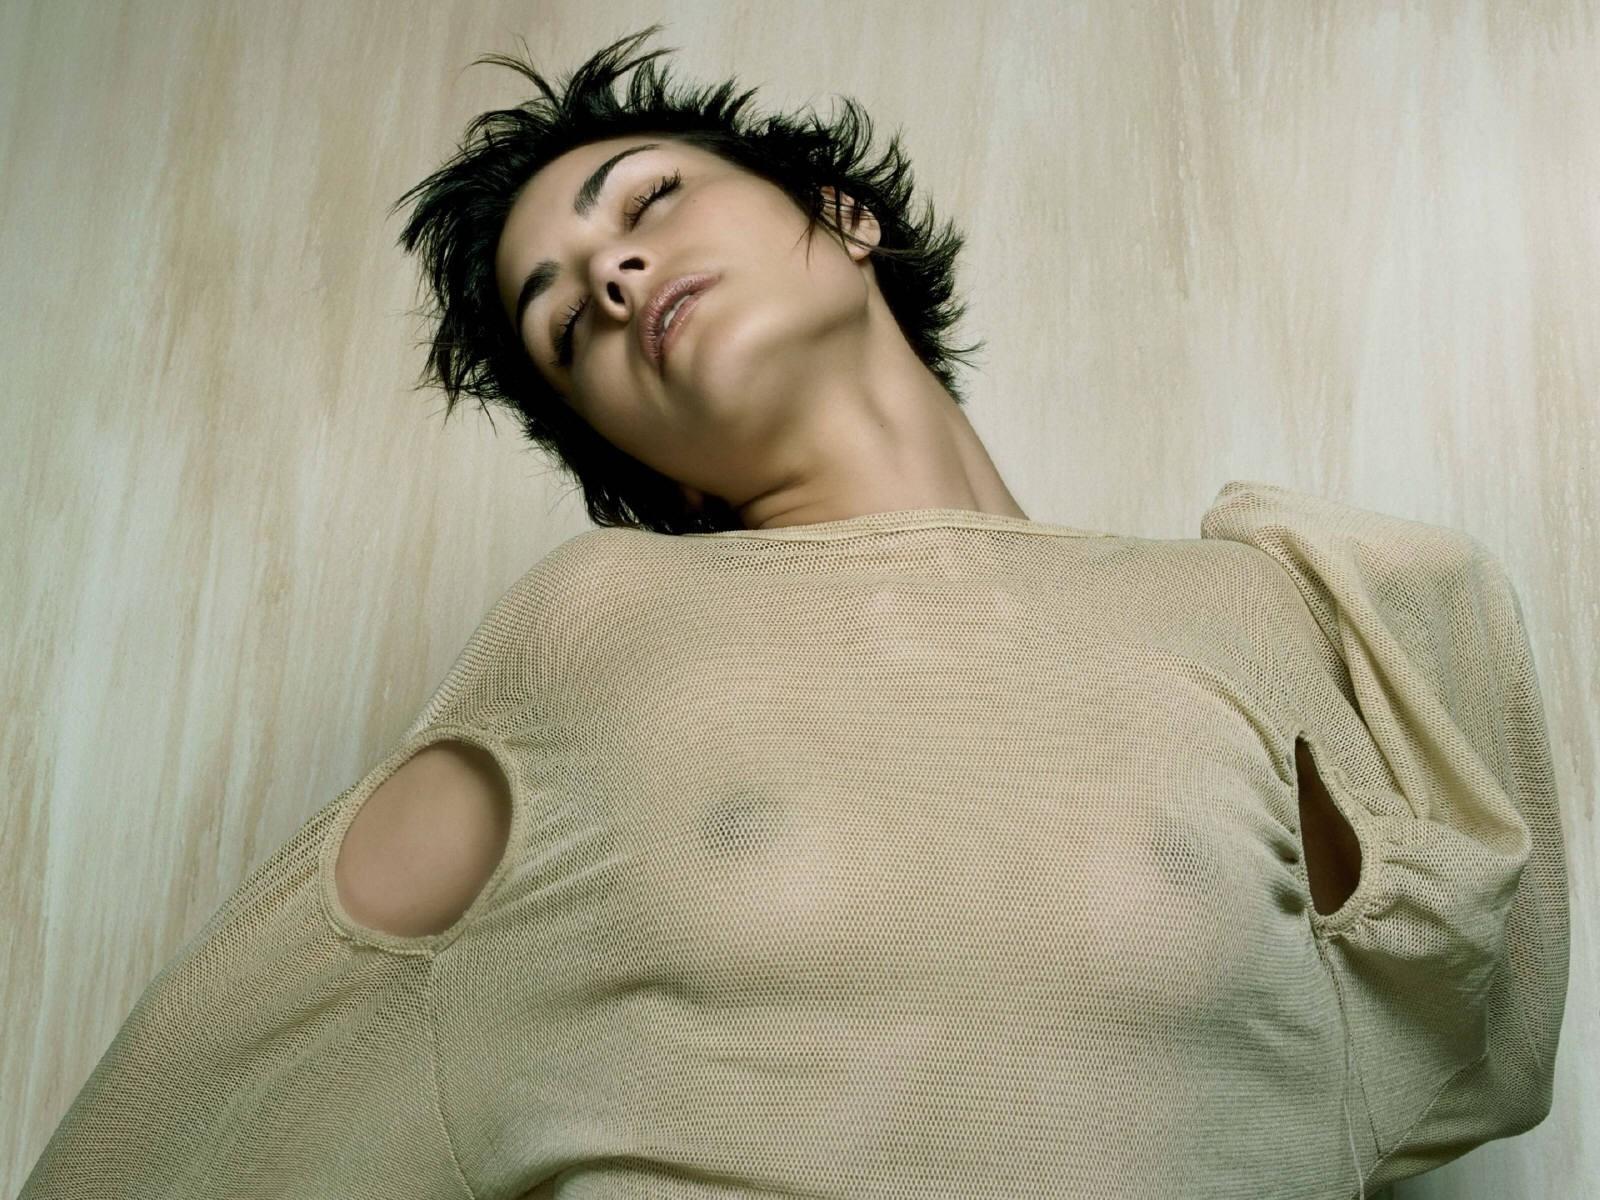 Wallpaper di Shannyn Sossamon a seno nudo